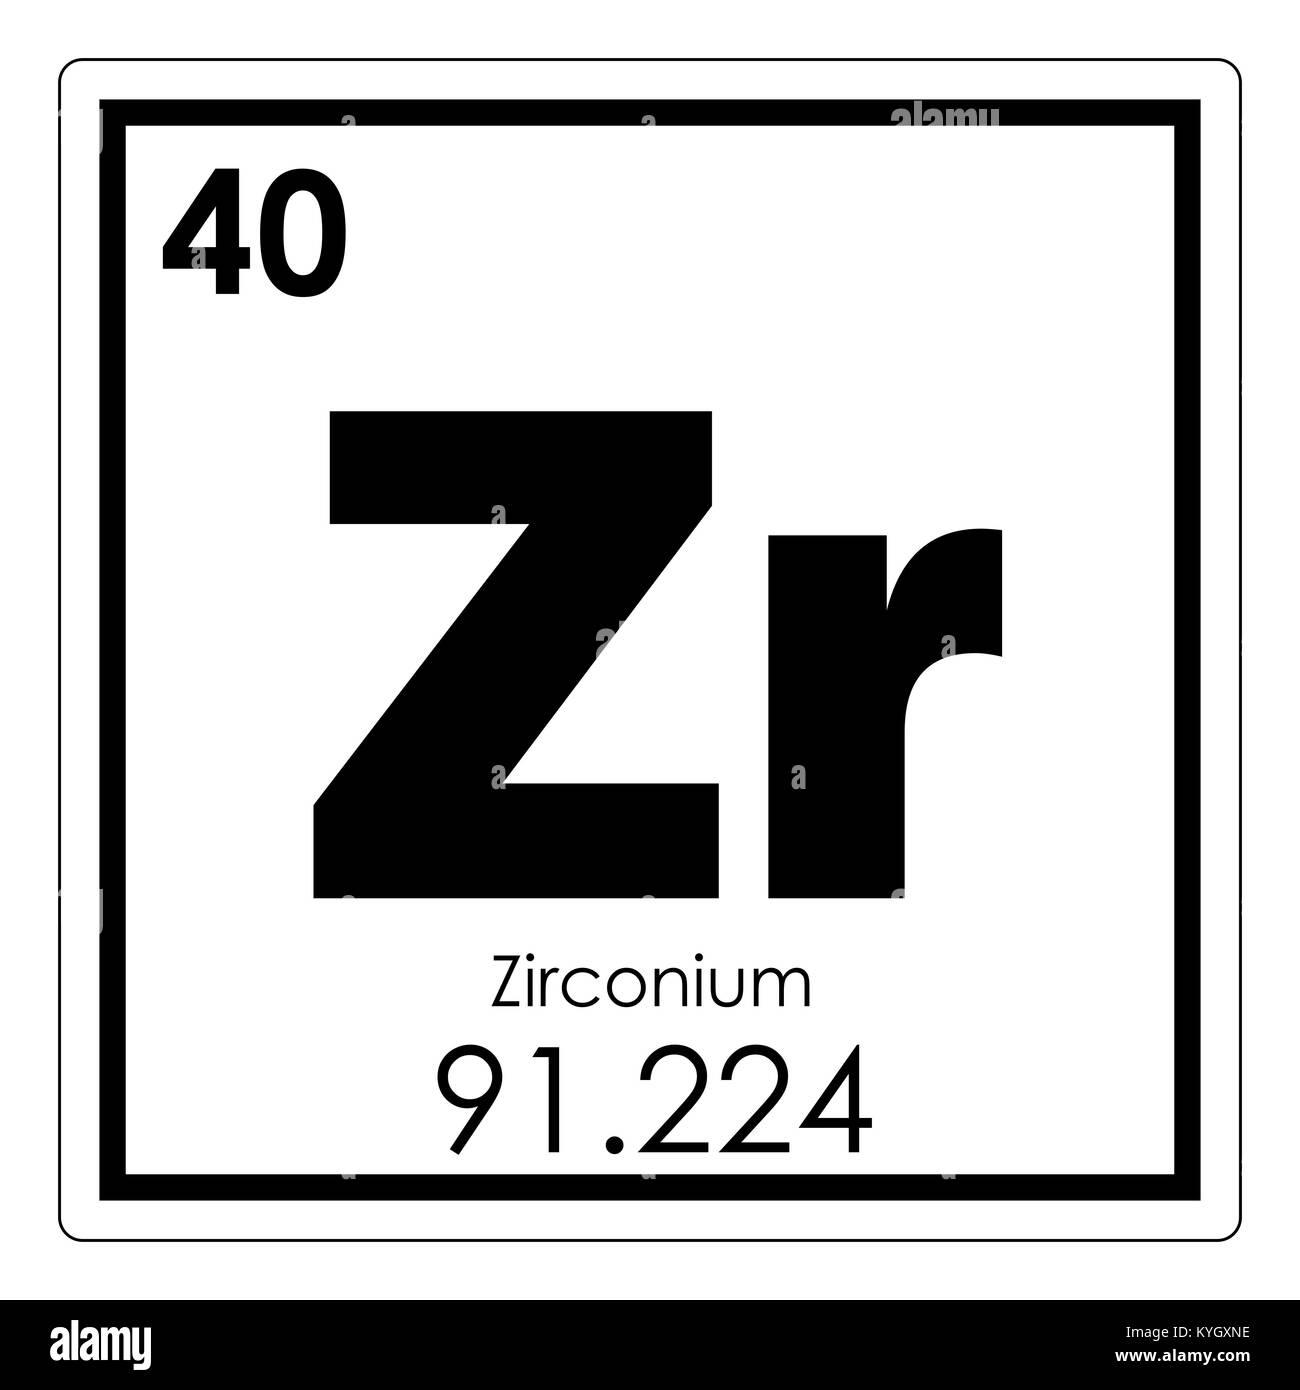 Zirconium chemical element periodic table science symbol stock photo zirconium chemical element periodic table science symbol urtaz Choice Image